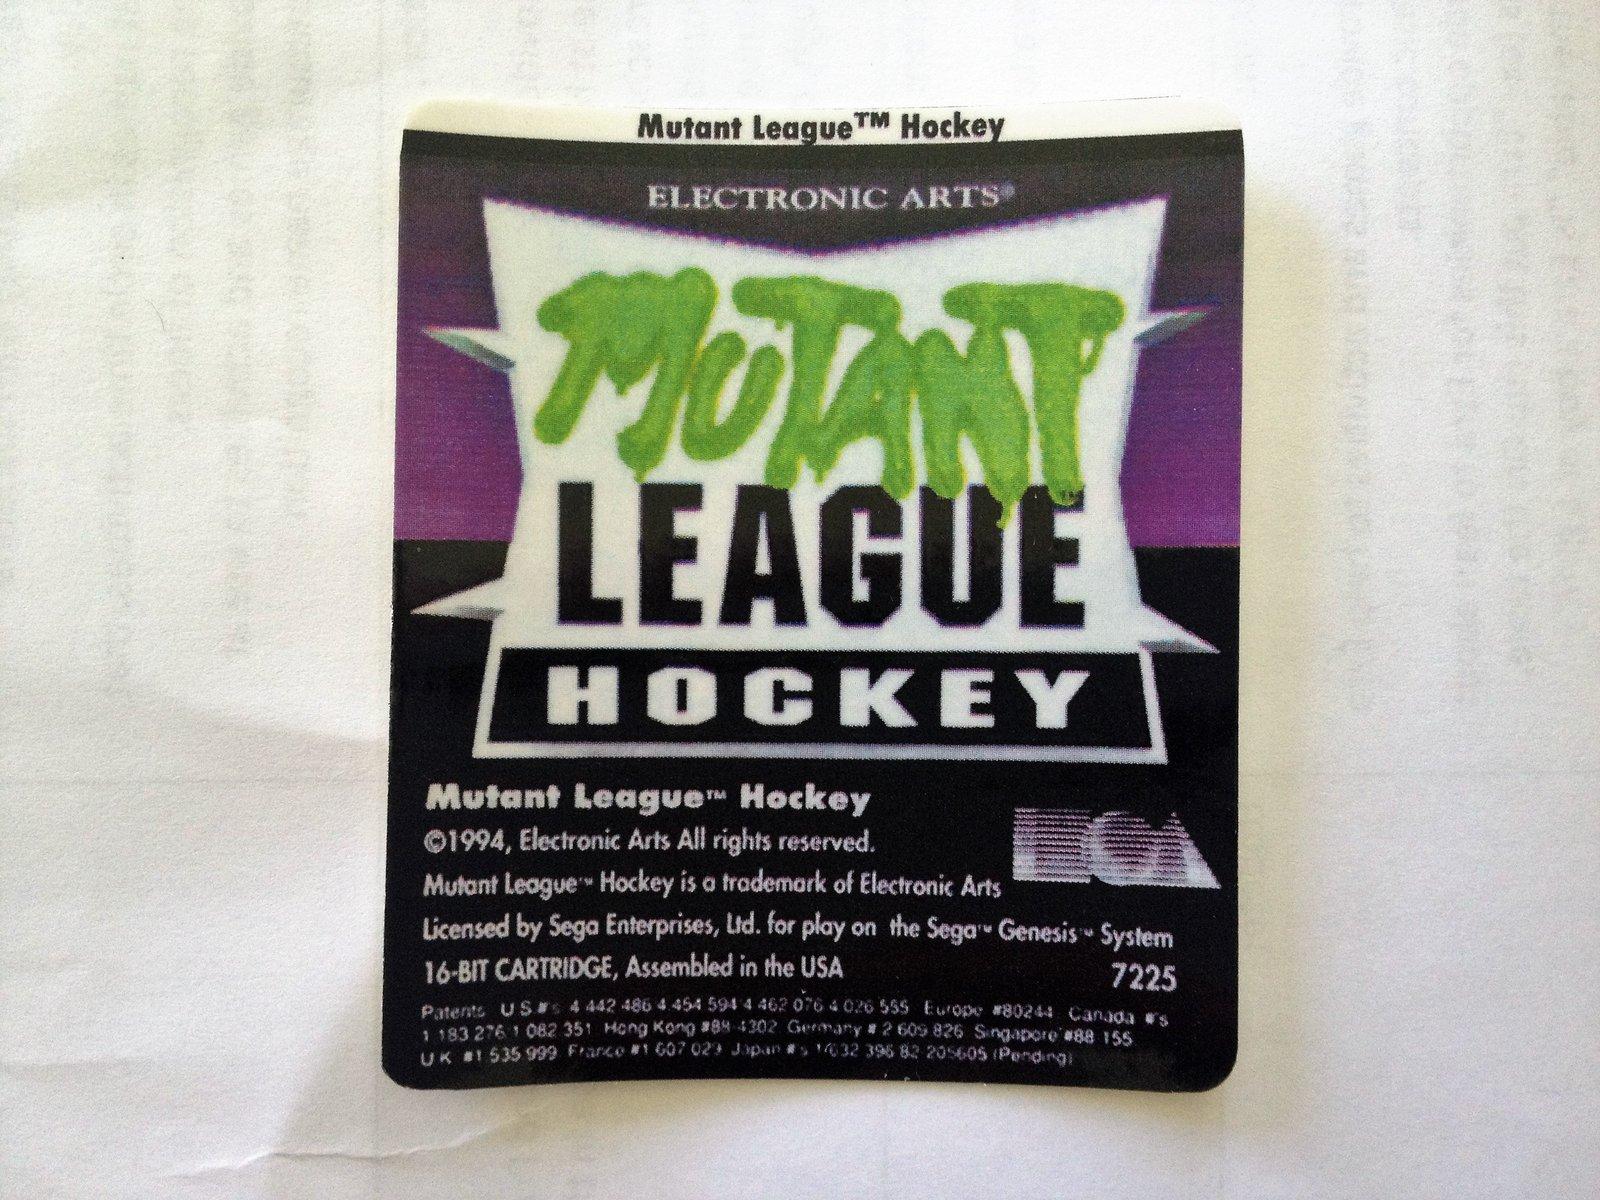 Mutant League Hockey (Sega Genesis)  - High-quality Glossy Pre-Cut Laminated Rep